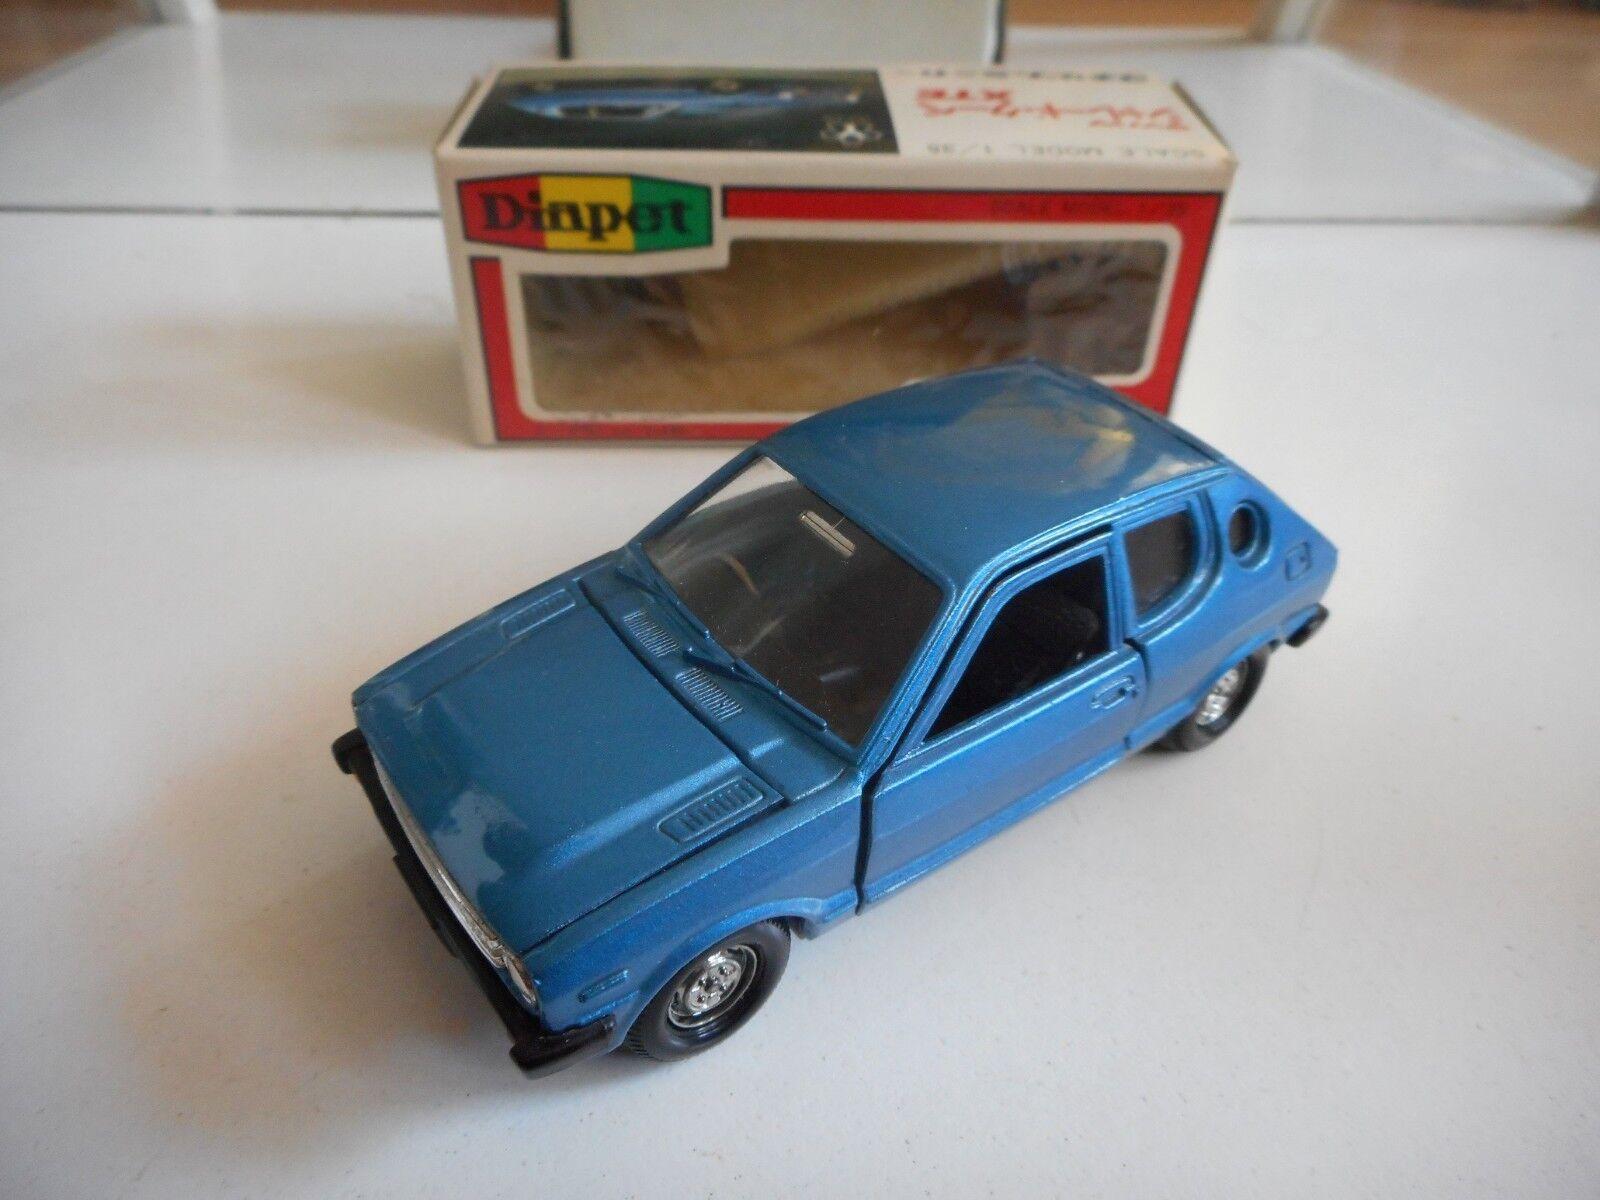 Yonezawa Toys Diapet Daihatsu Charade Charade Charade Coupe XTE in bluee on 1 40 in Box c0827c